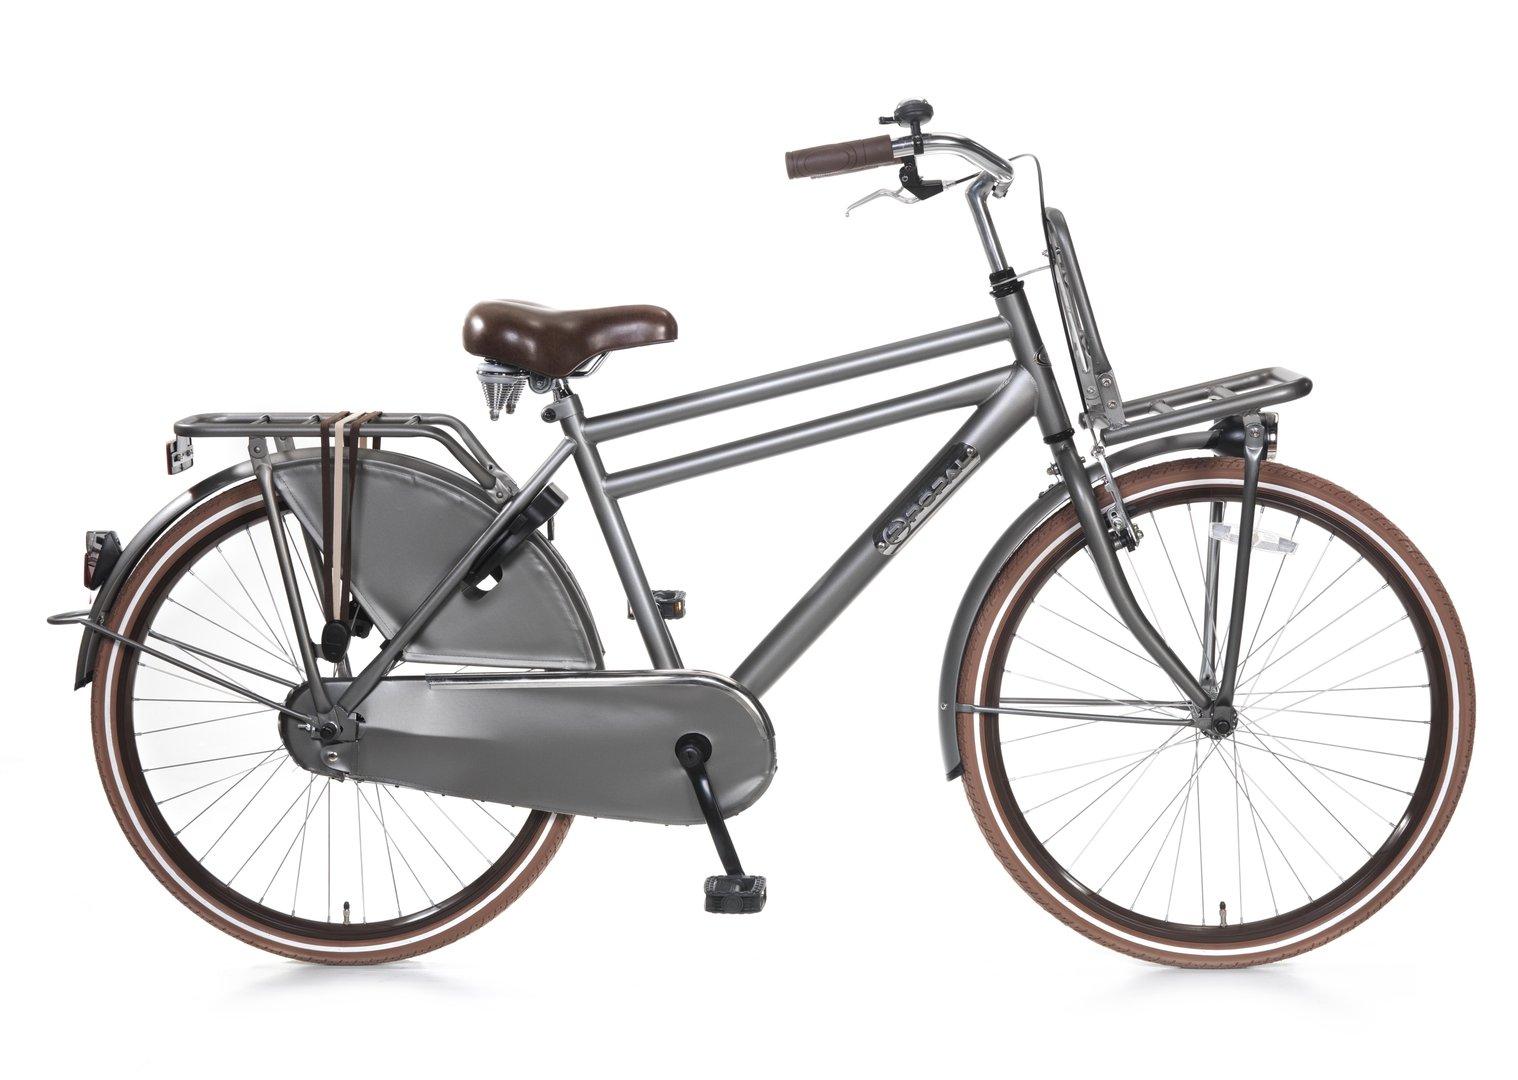 26 zoll herren jugend lifestyle holland fahrrad titanium. Black Bedroom Furniture Sets. Home Design Ideas